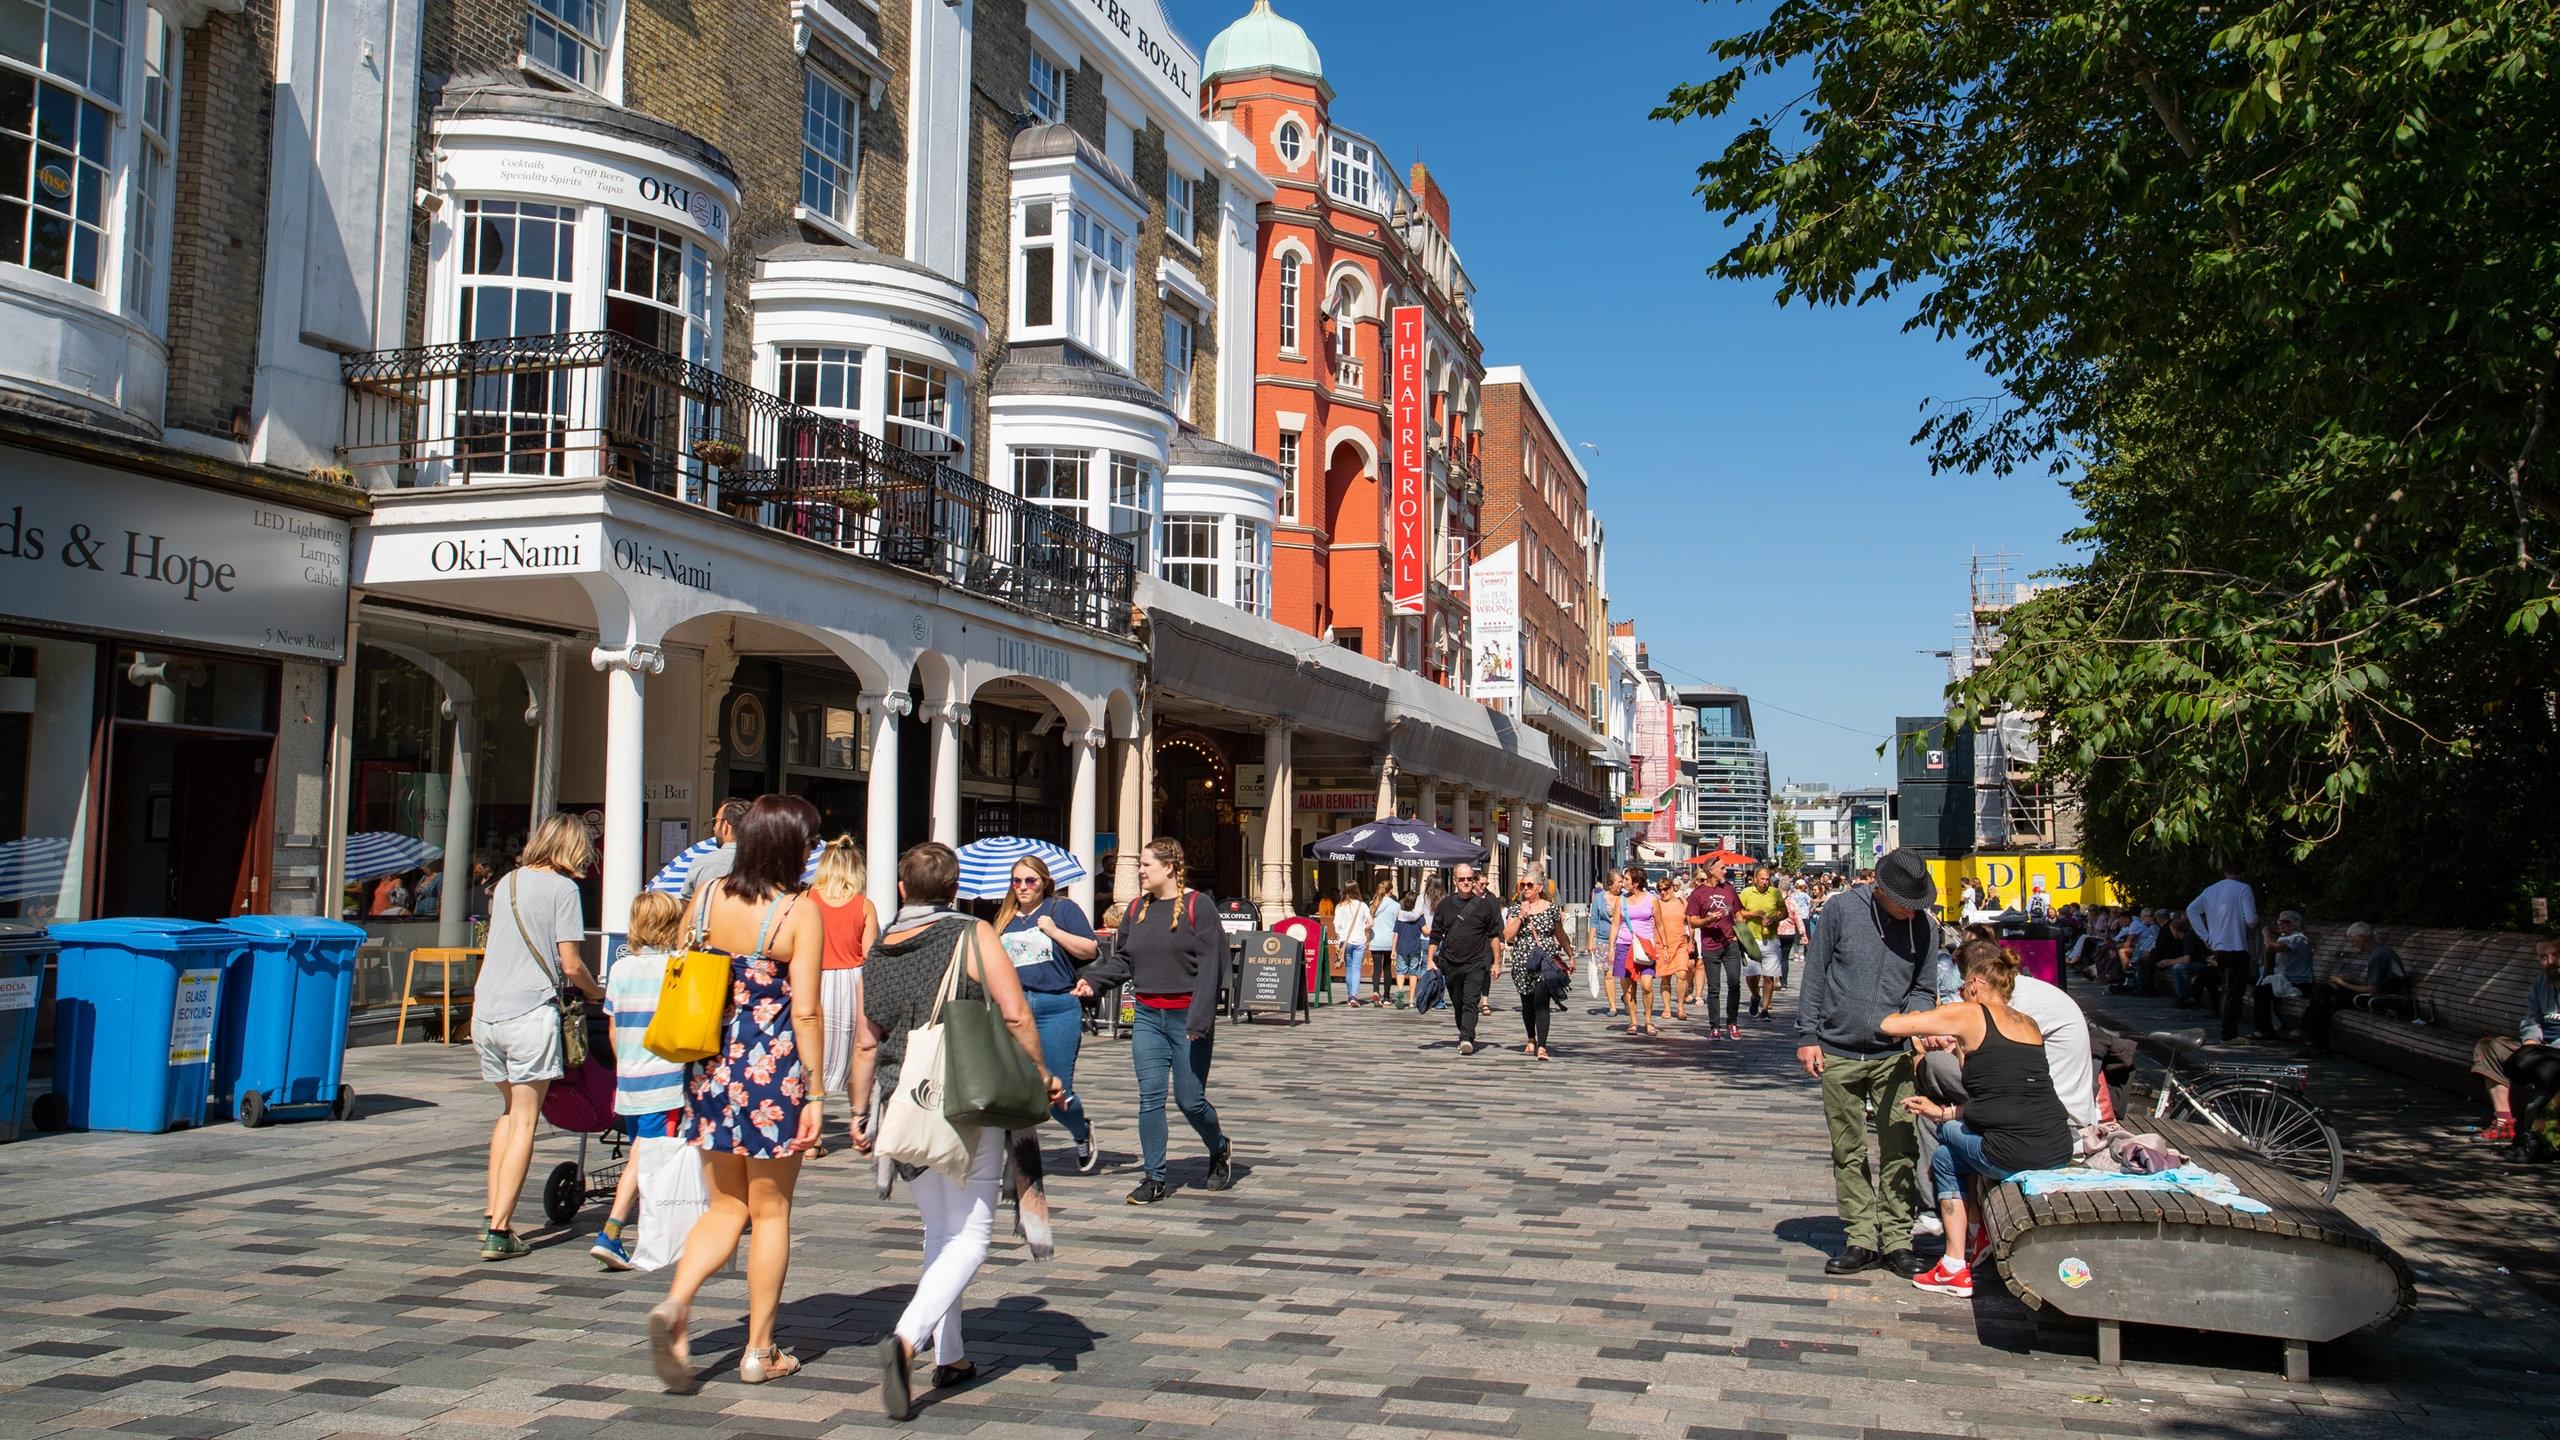 Brighton-Hove, England, United Kingdom